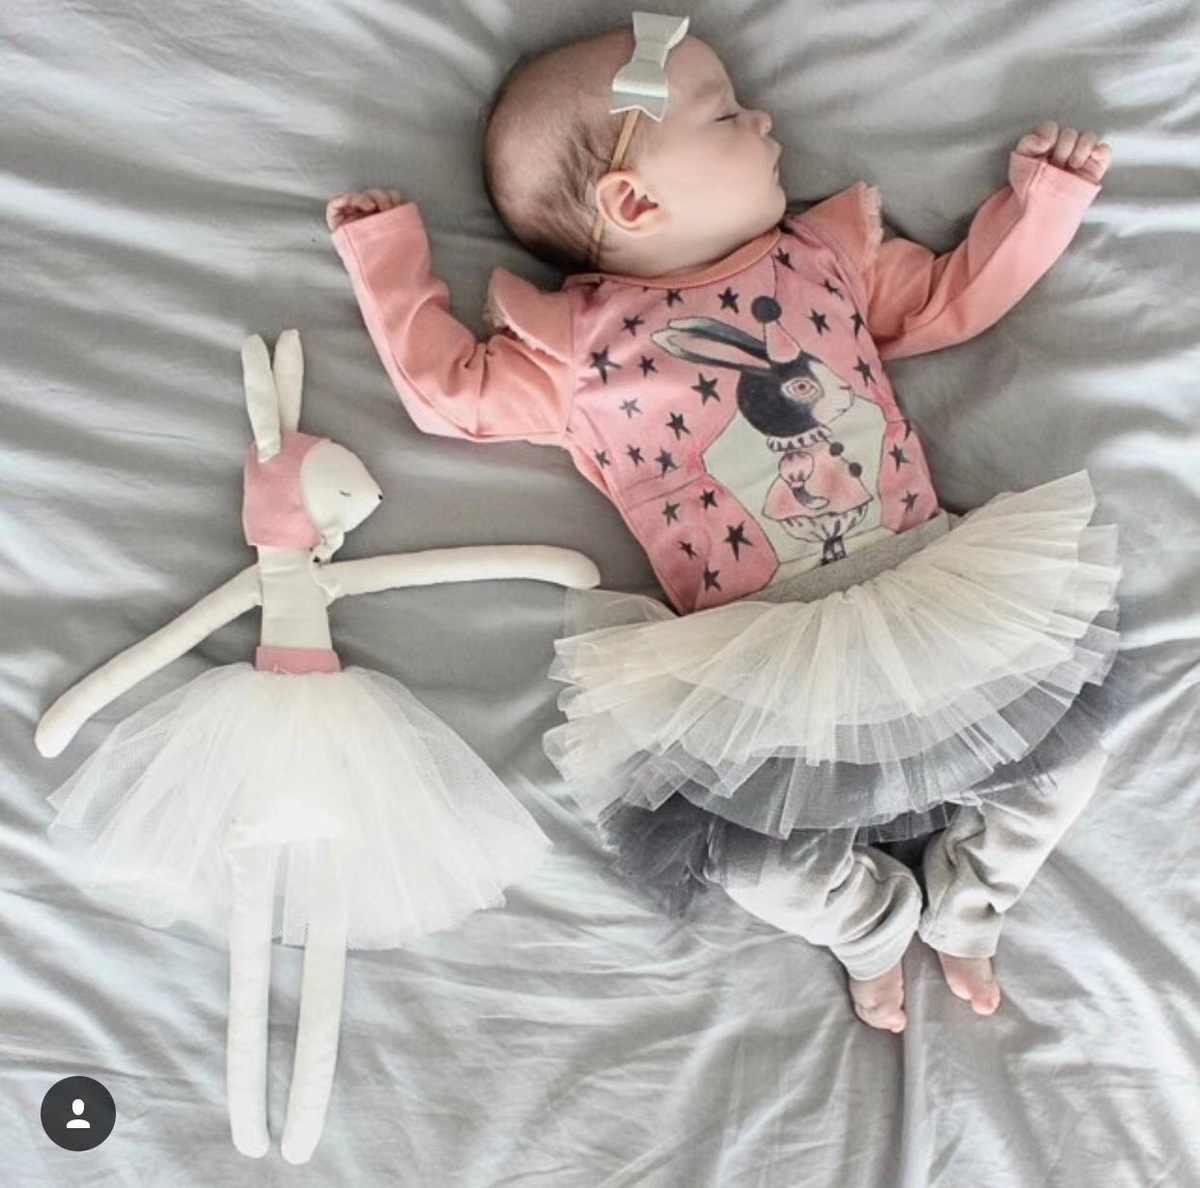 60c05ce8a2ea1 ... Girls Leggings 2019 Cotton Culottes Tutu Skirt For Girl Baby Girl  Shining Lace Leggings Spring Autumn ...